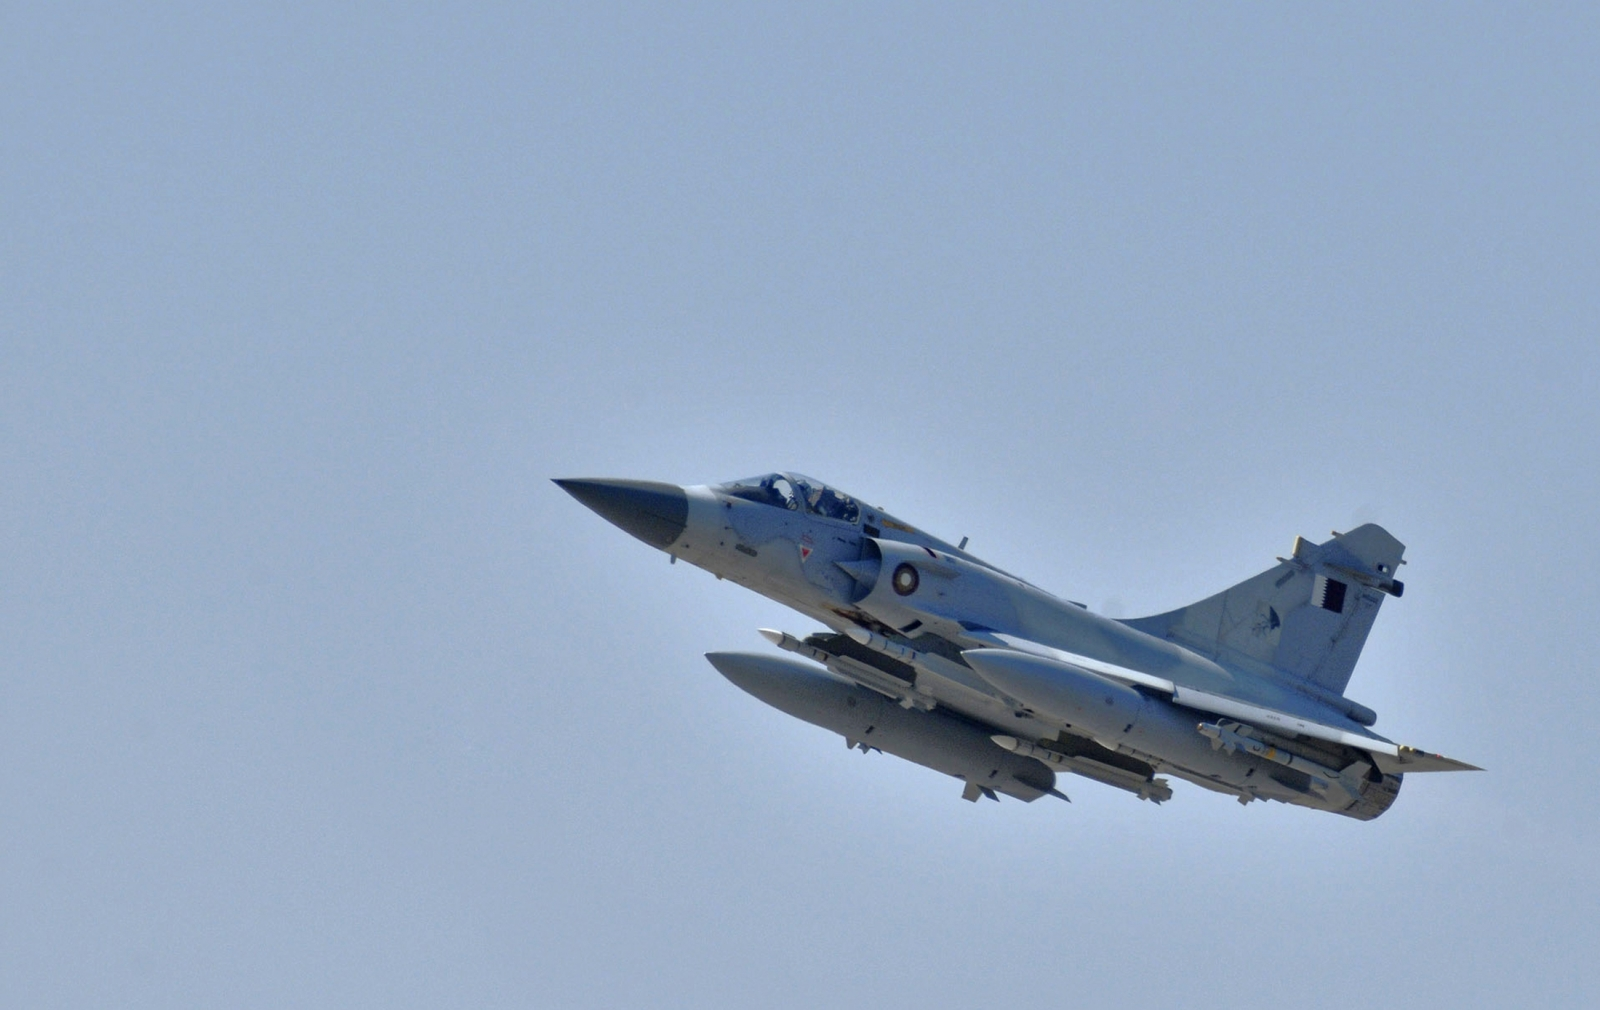 Qatar Emiri Air Force Dassault 2000-5